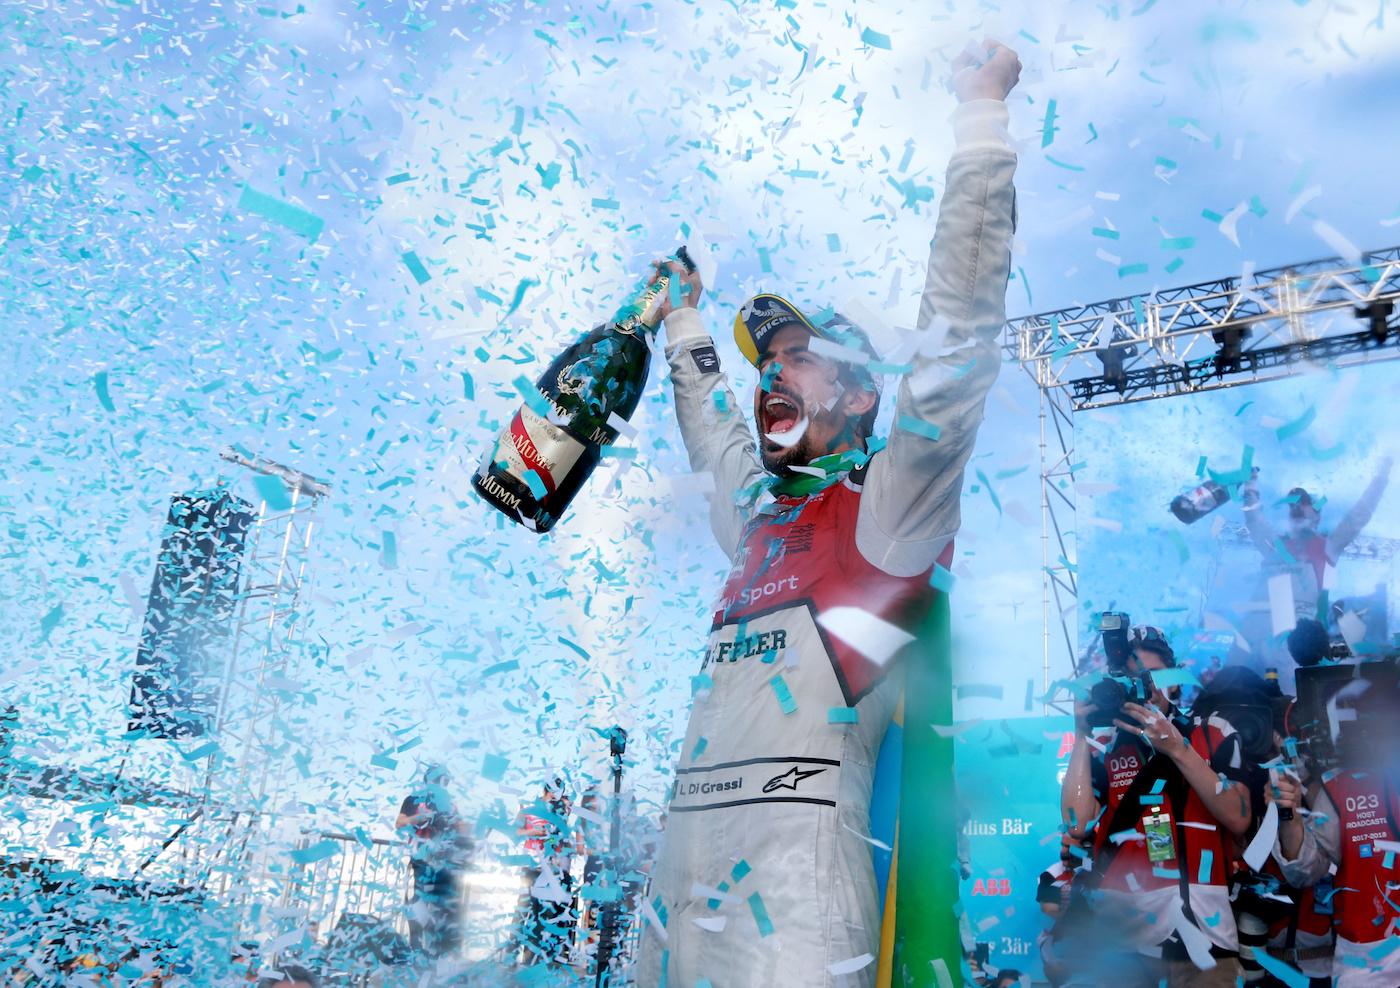 Lucas di Grassi auf dem Siegerpodest. (Audi Motorsport/Michael Kunkel)